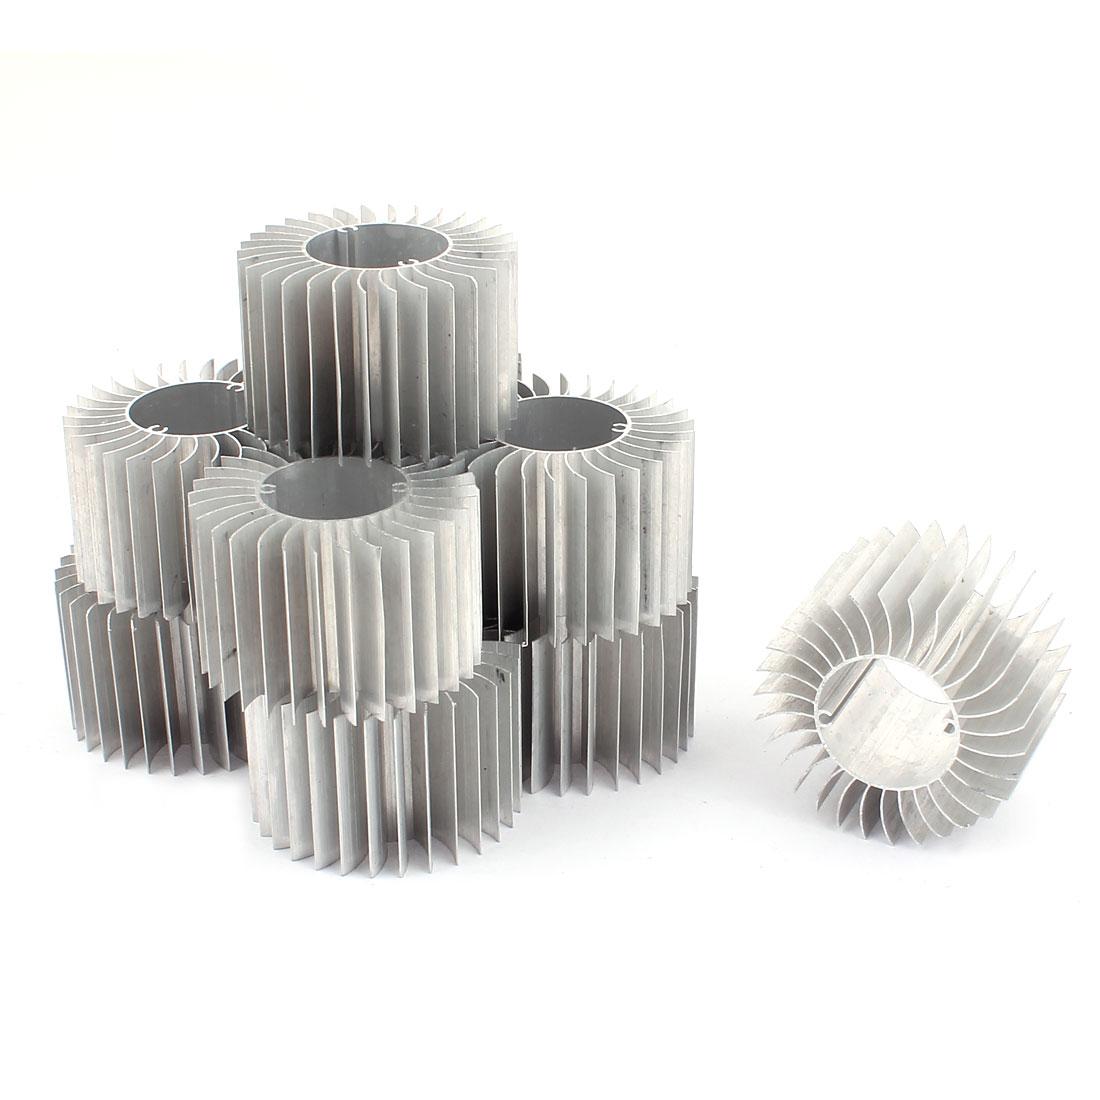 10Pcs LED Lamp Aluminum Heatsink Radiator Cooling Fin 57mmx29mmx37mm Silver Tone